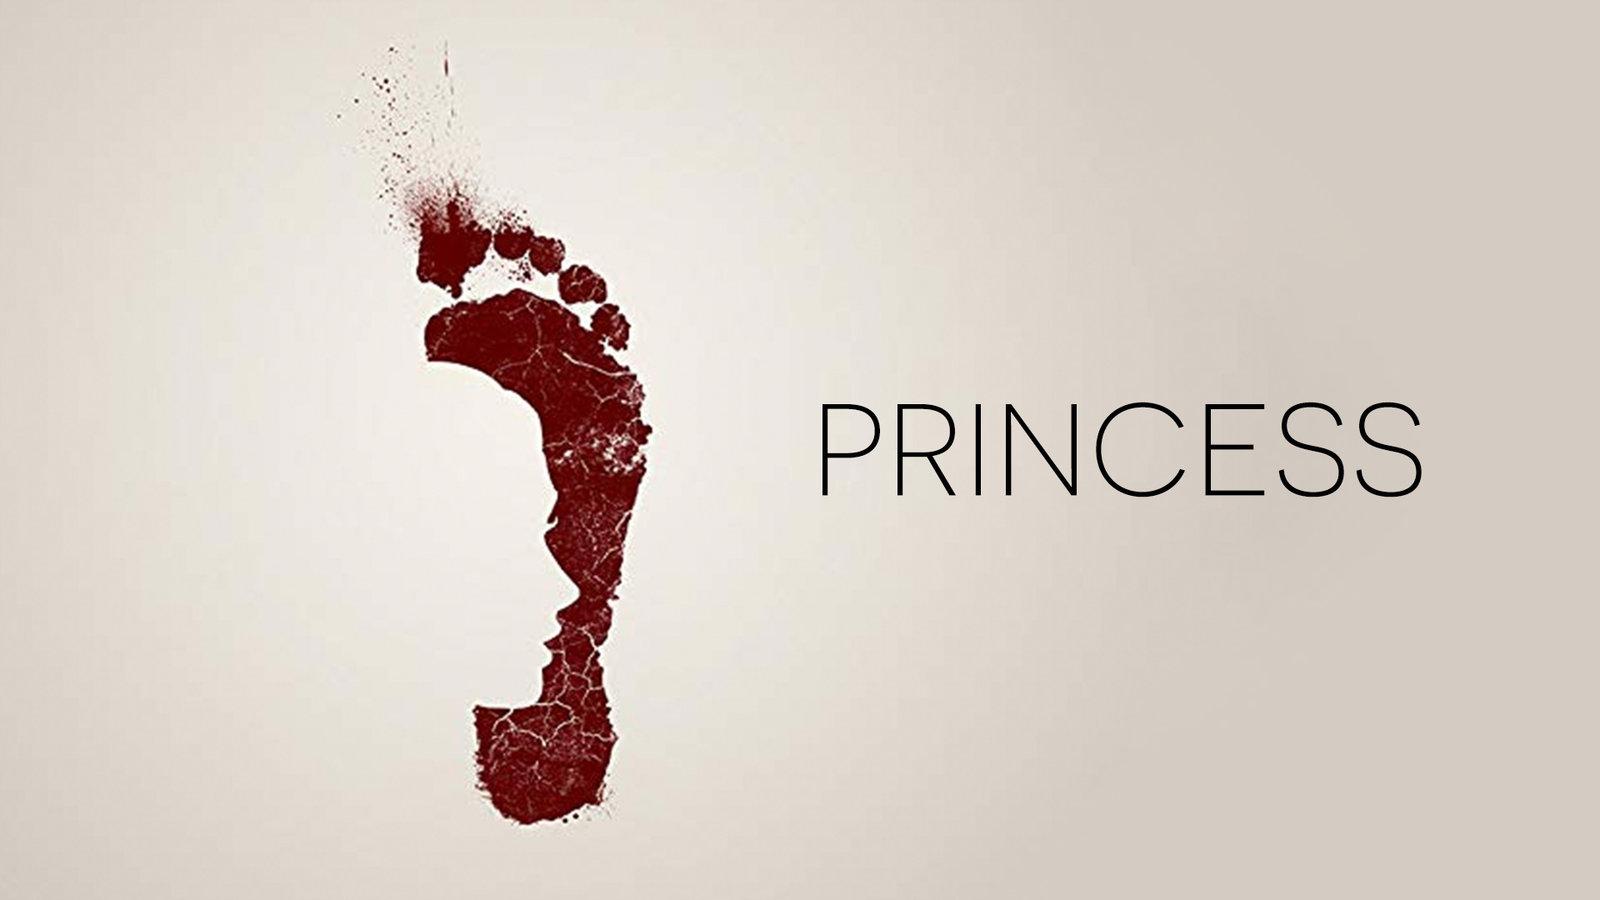 The Princess - A Princesa